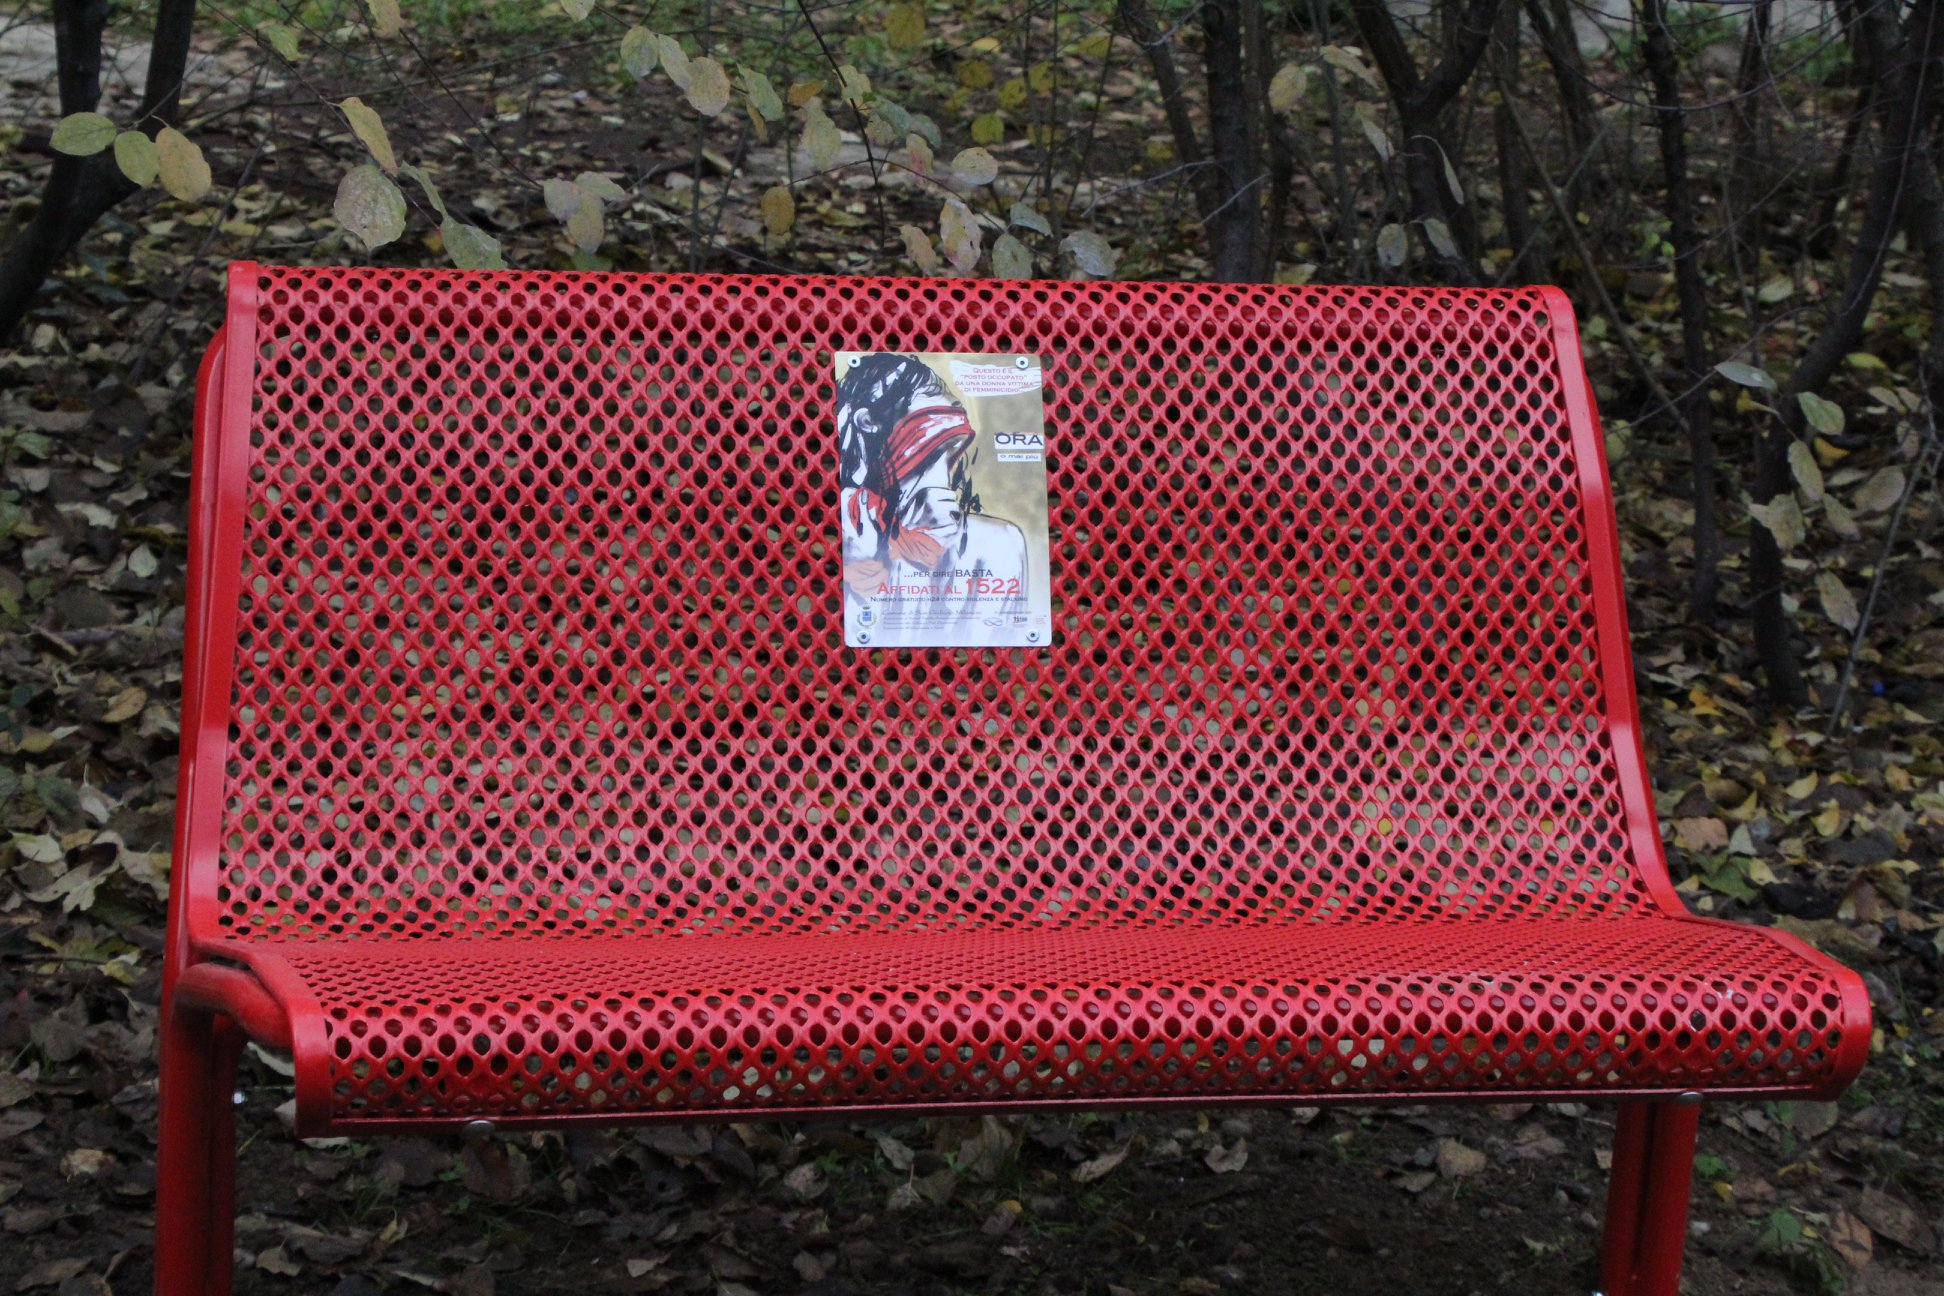 Una panchina rossa anche al Levi